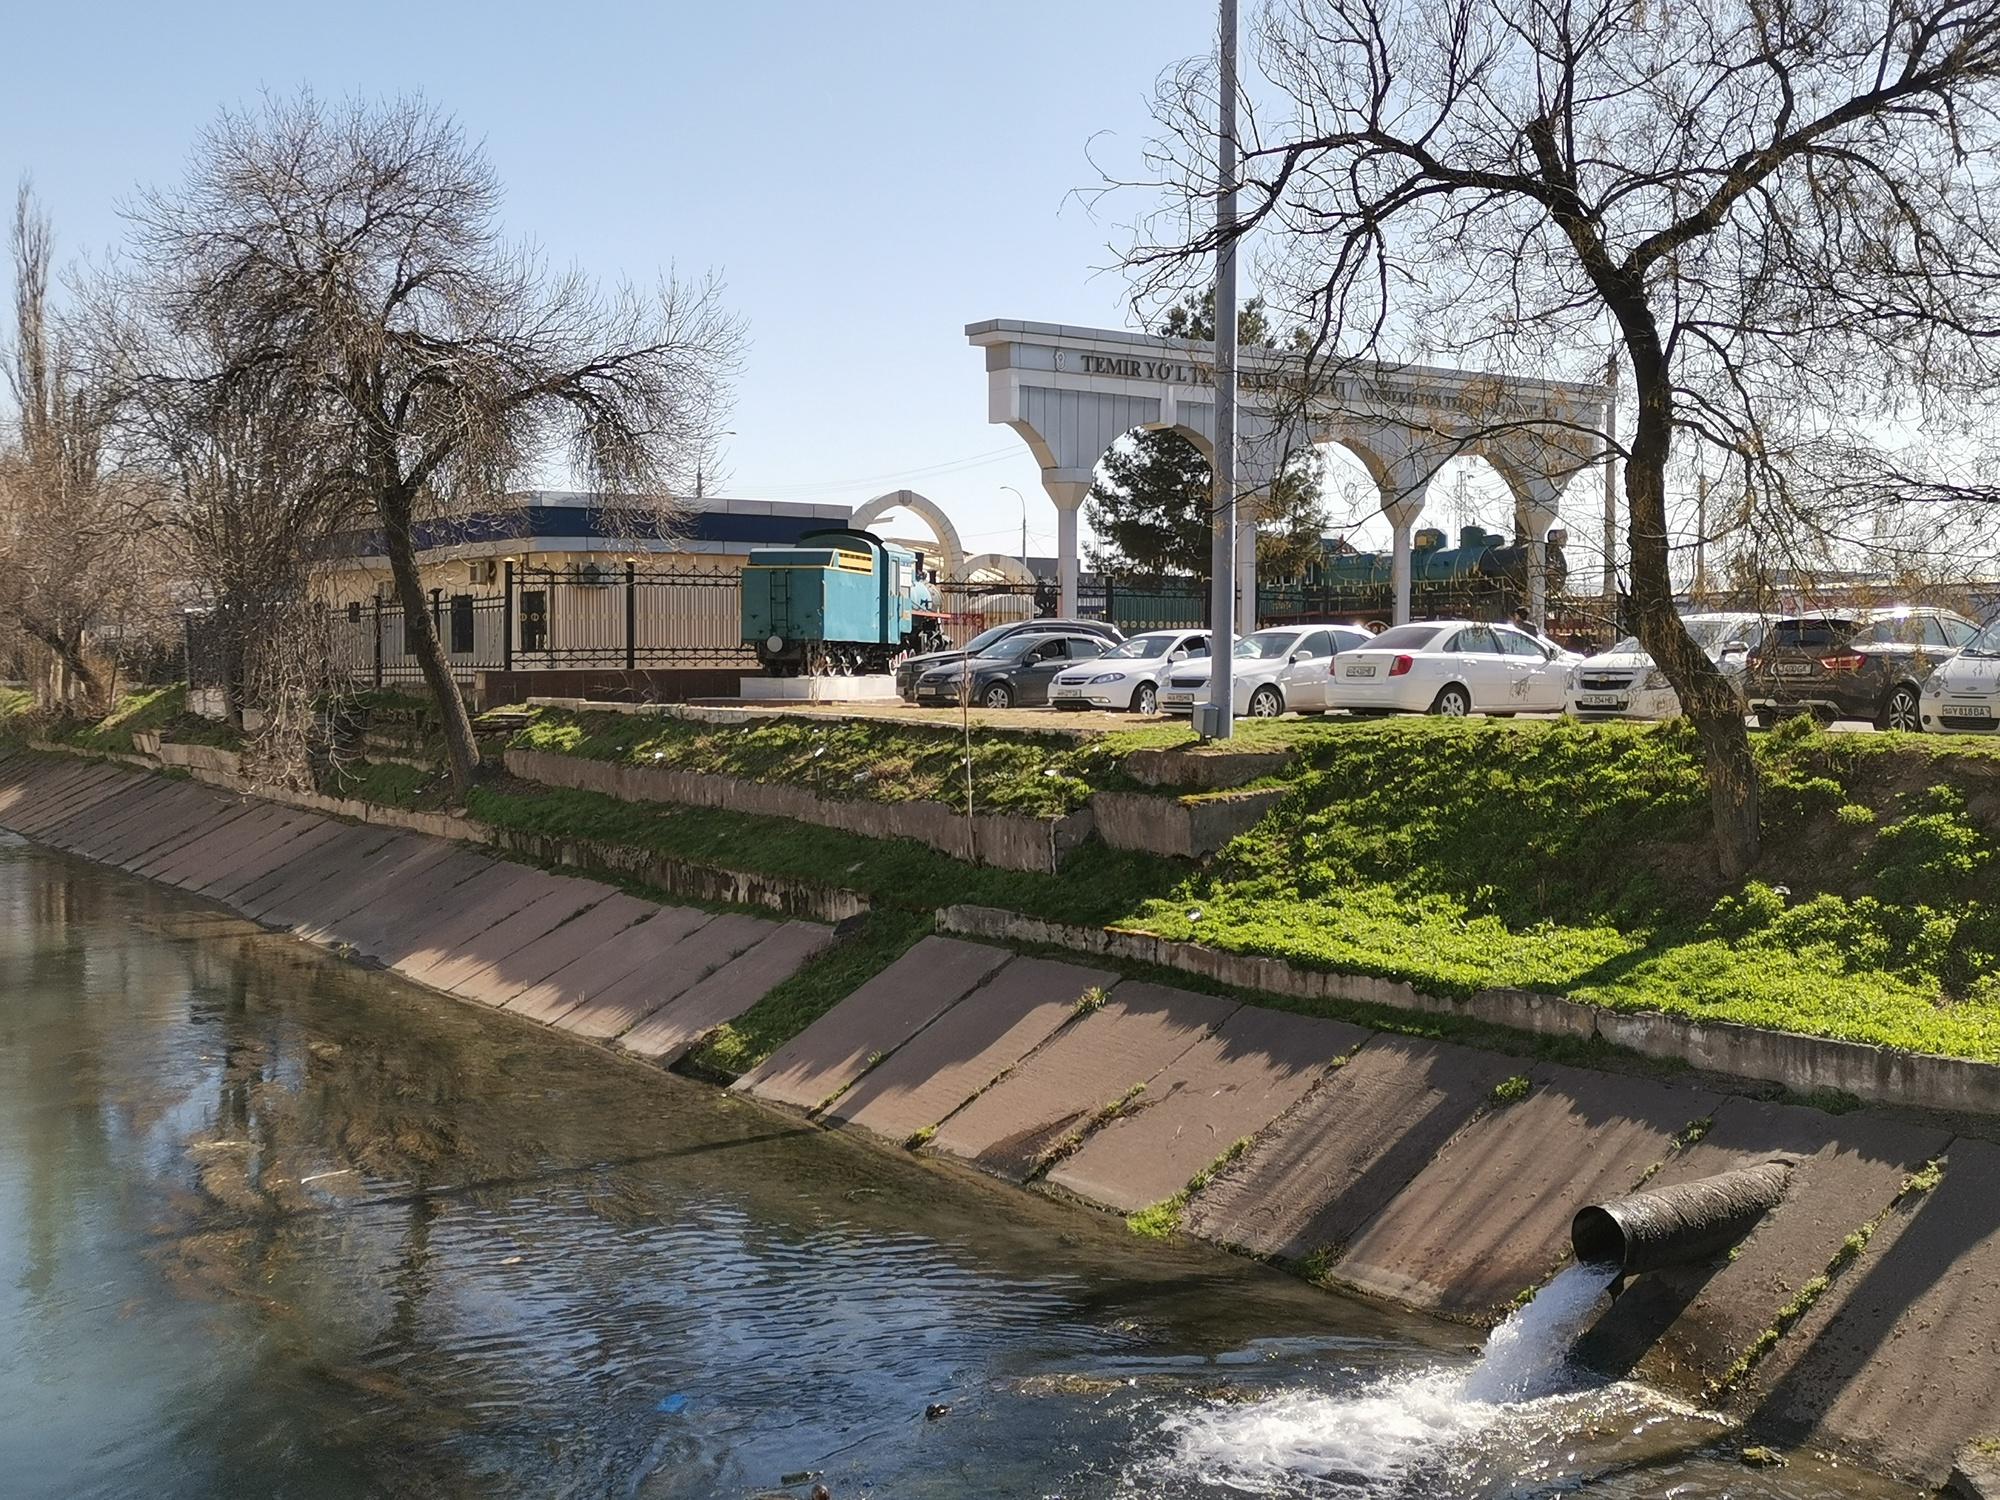 Ташкентский музей железнодорожной техники, Ташкент, Узбекистан